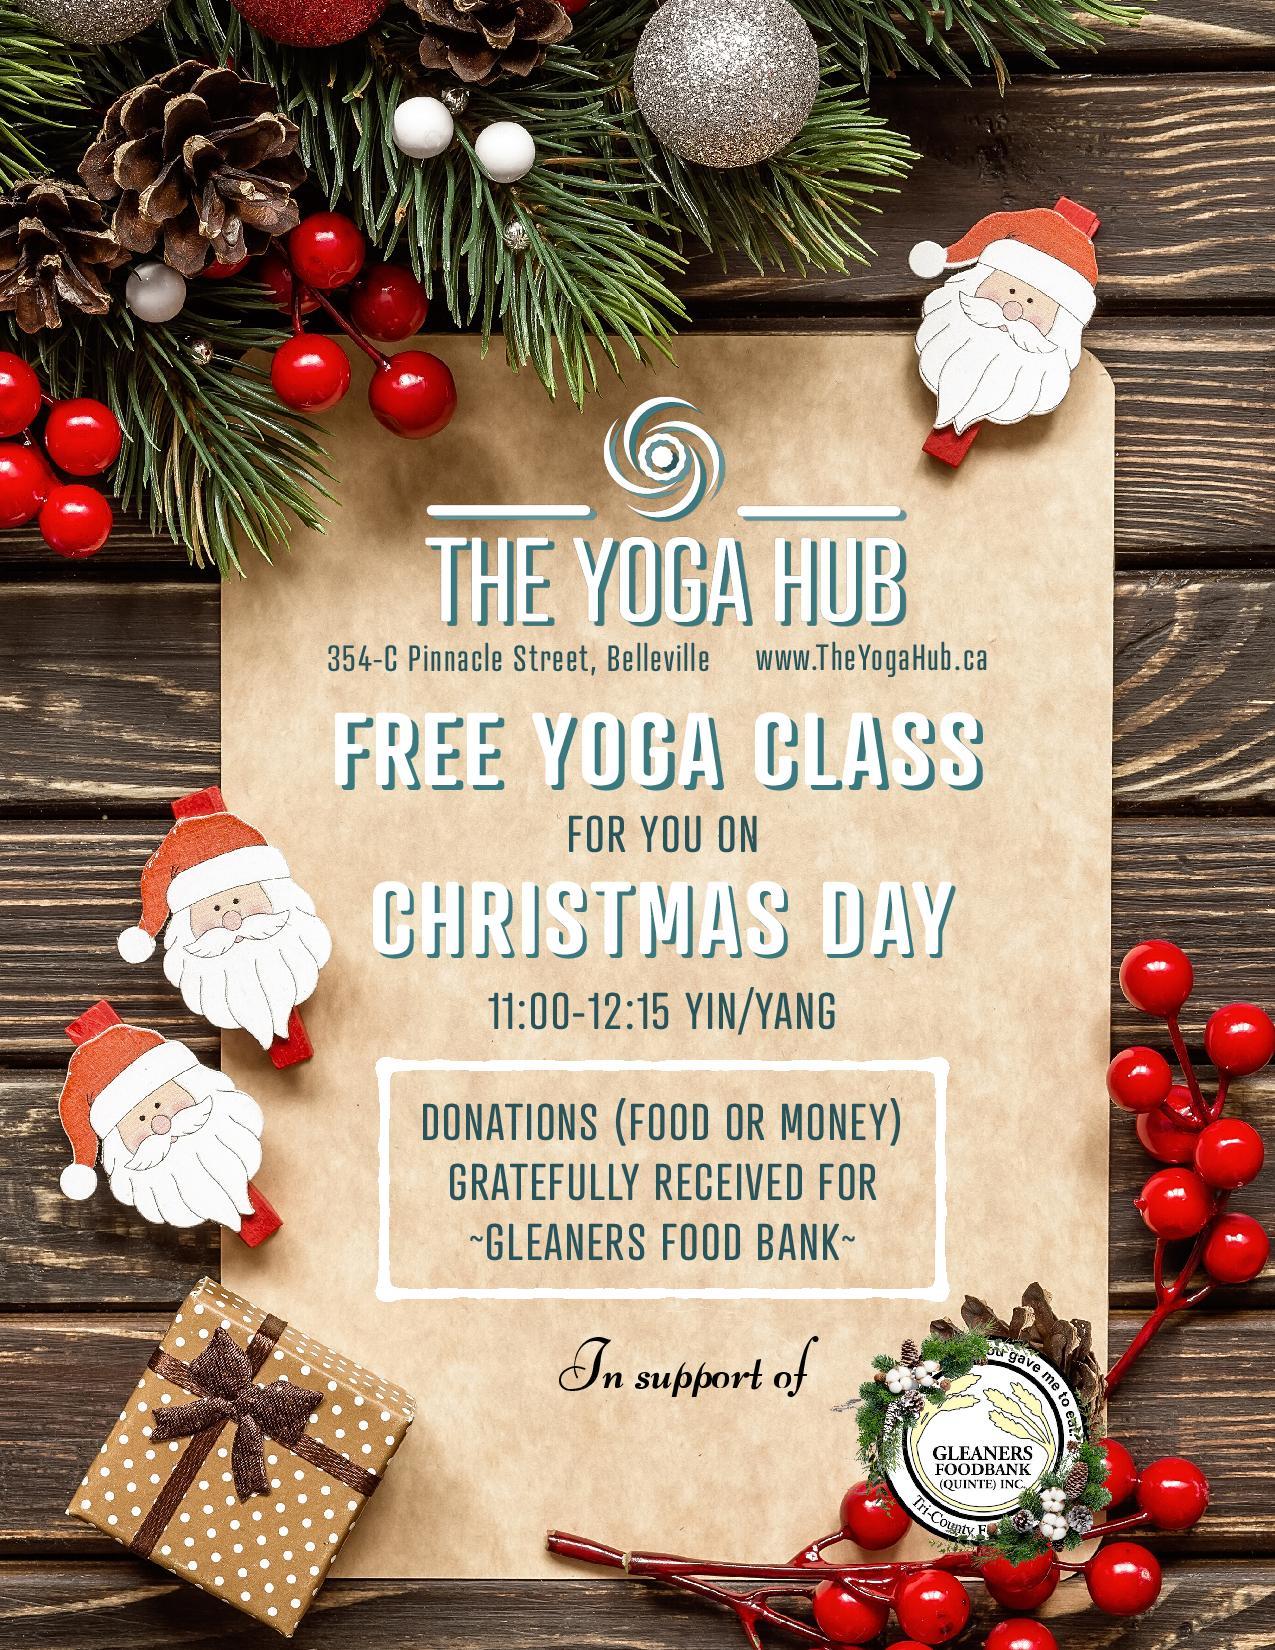 Free Yoga Class on Christmas Day!